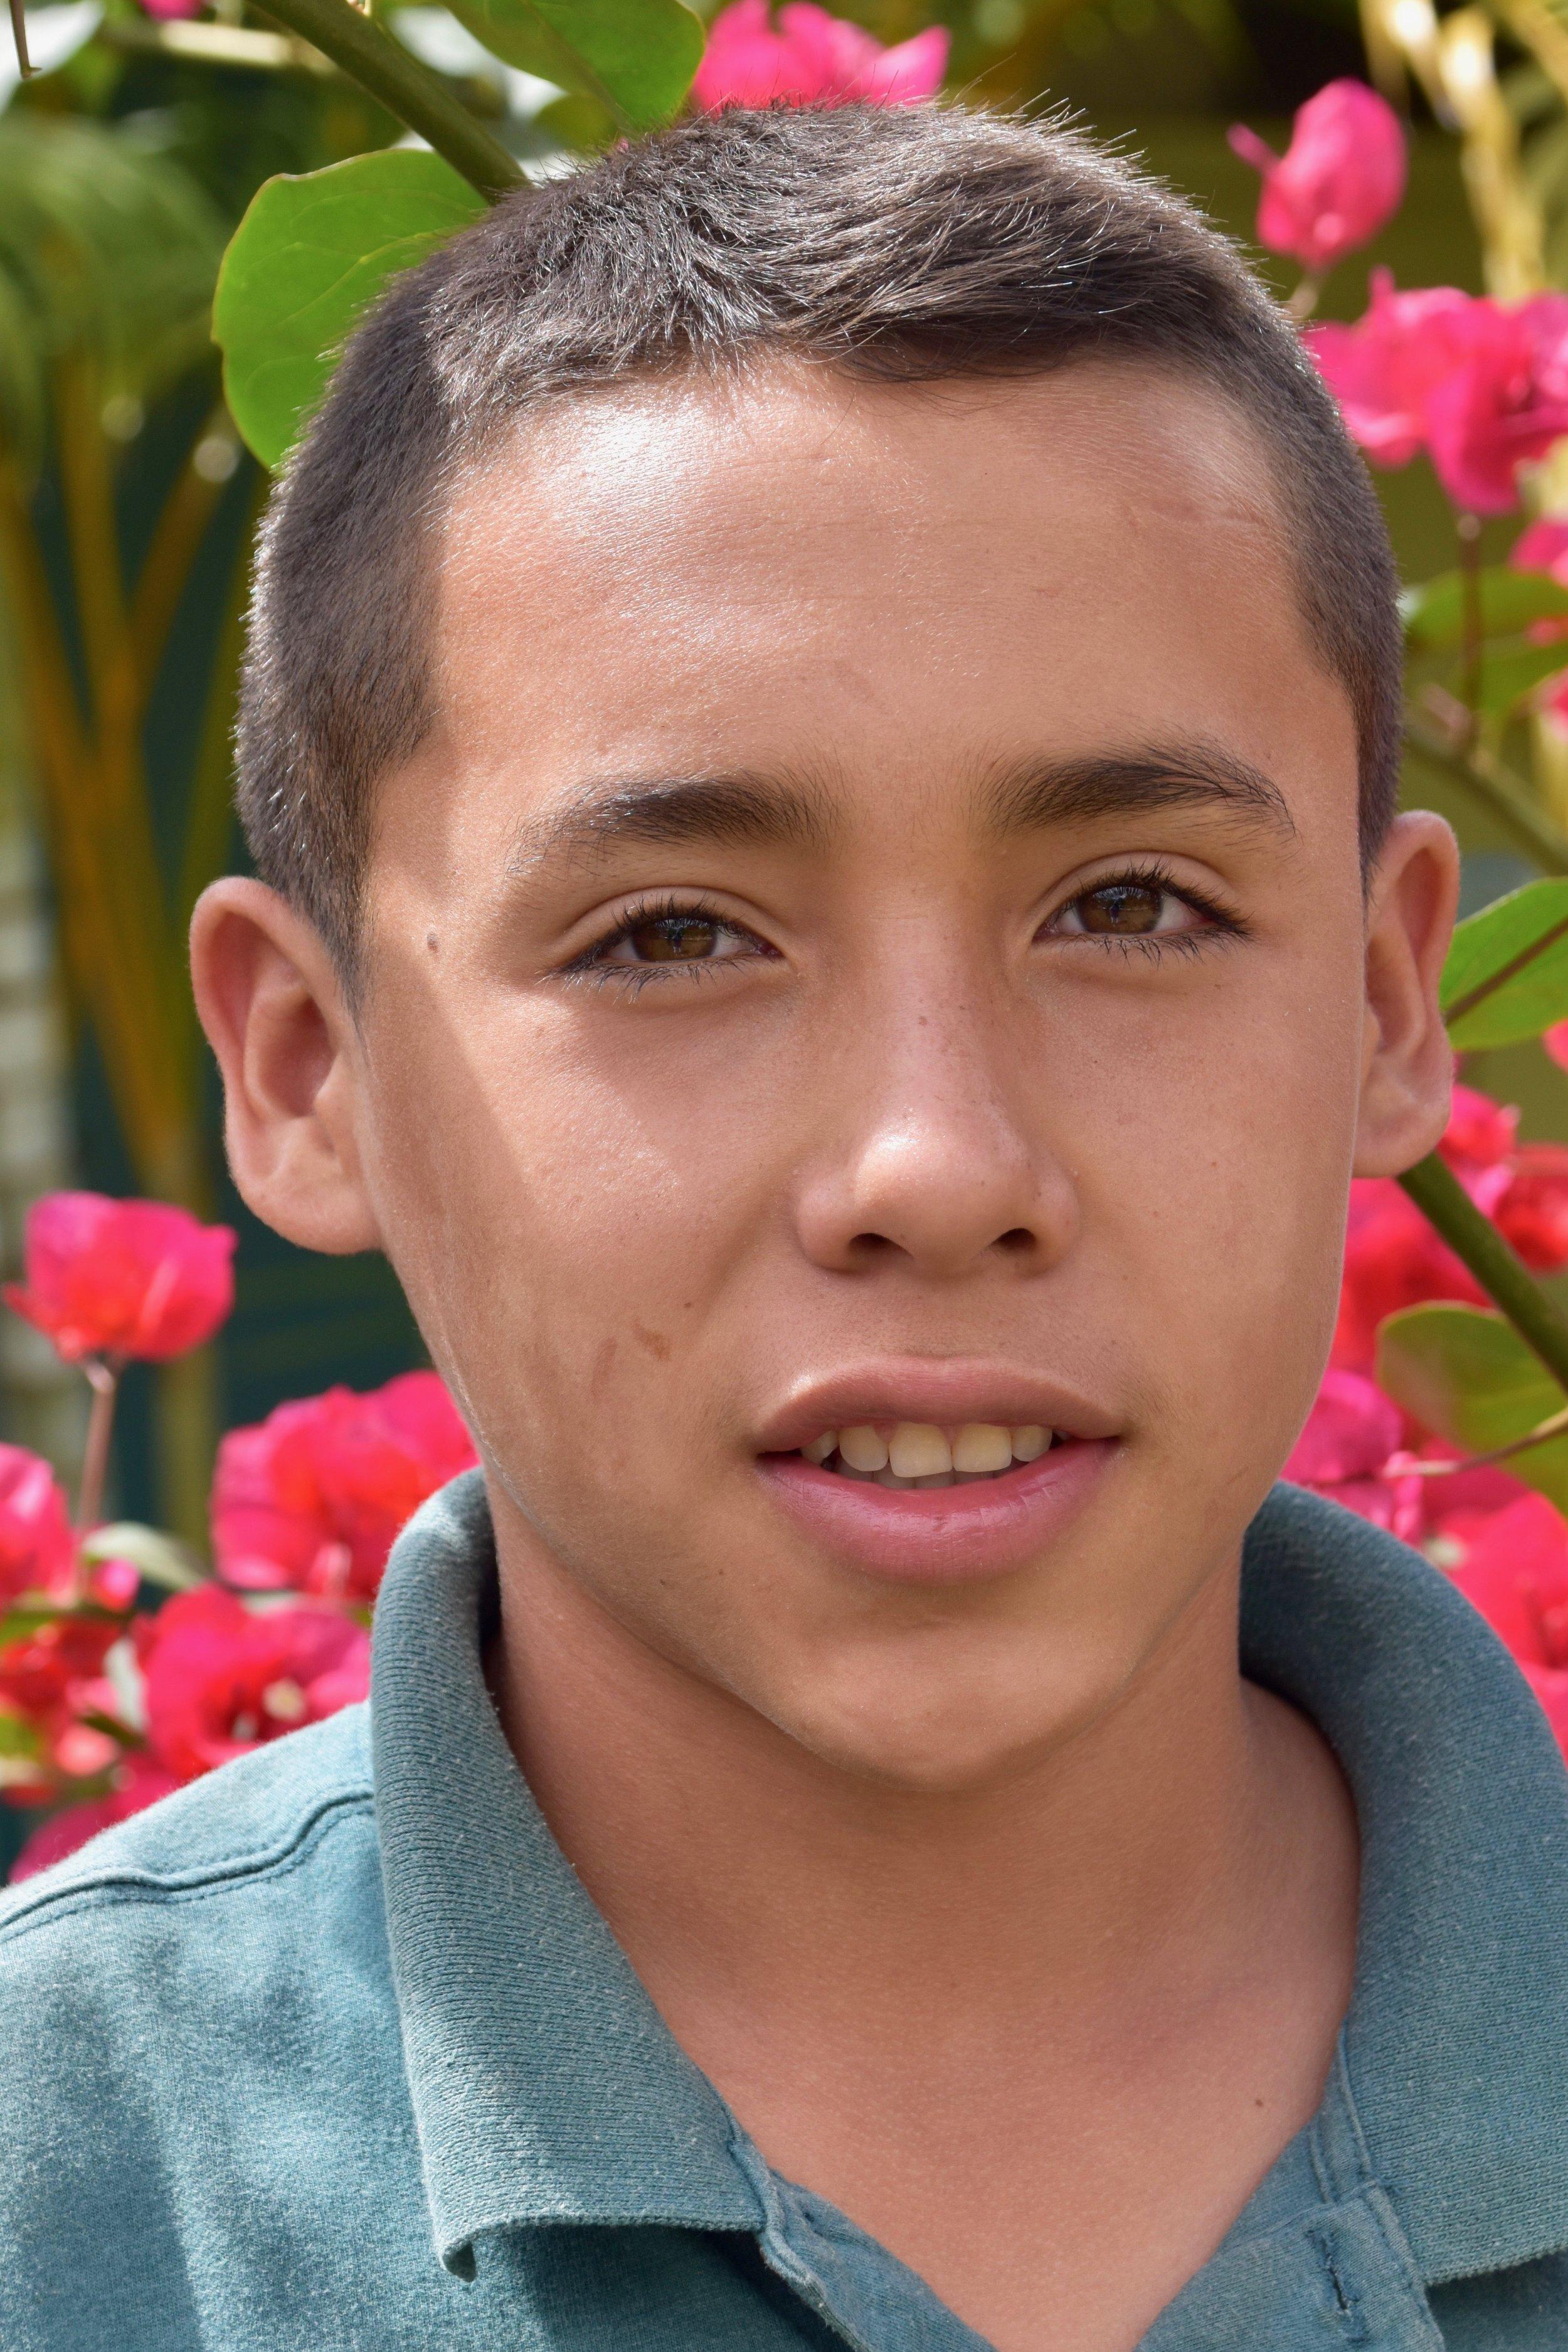 JONATHAN ARGUETA (11/12/04)